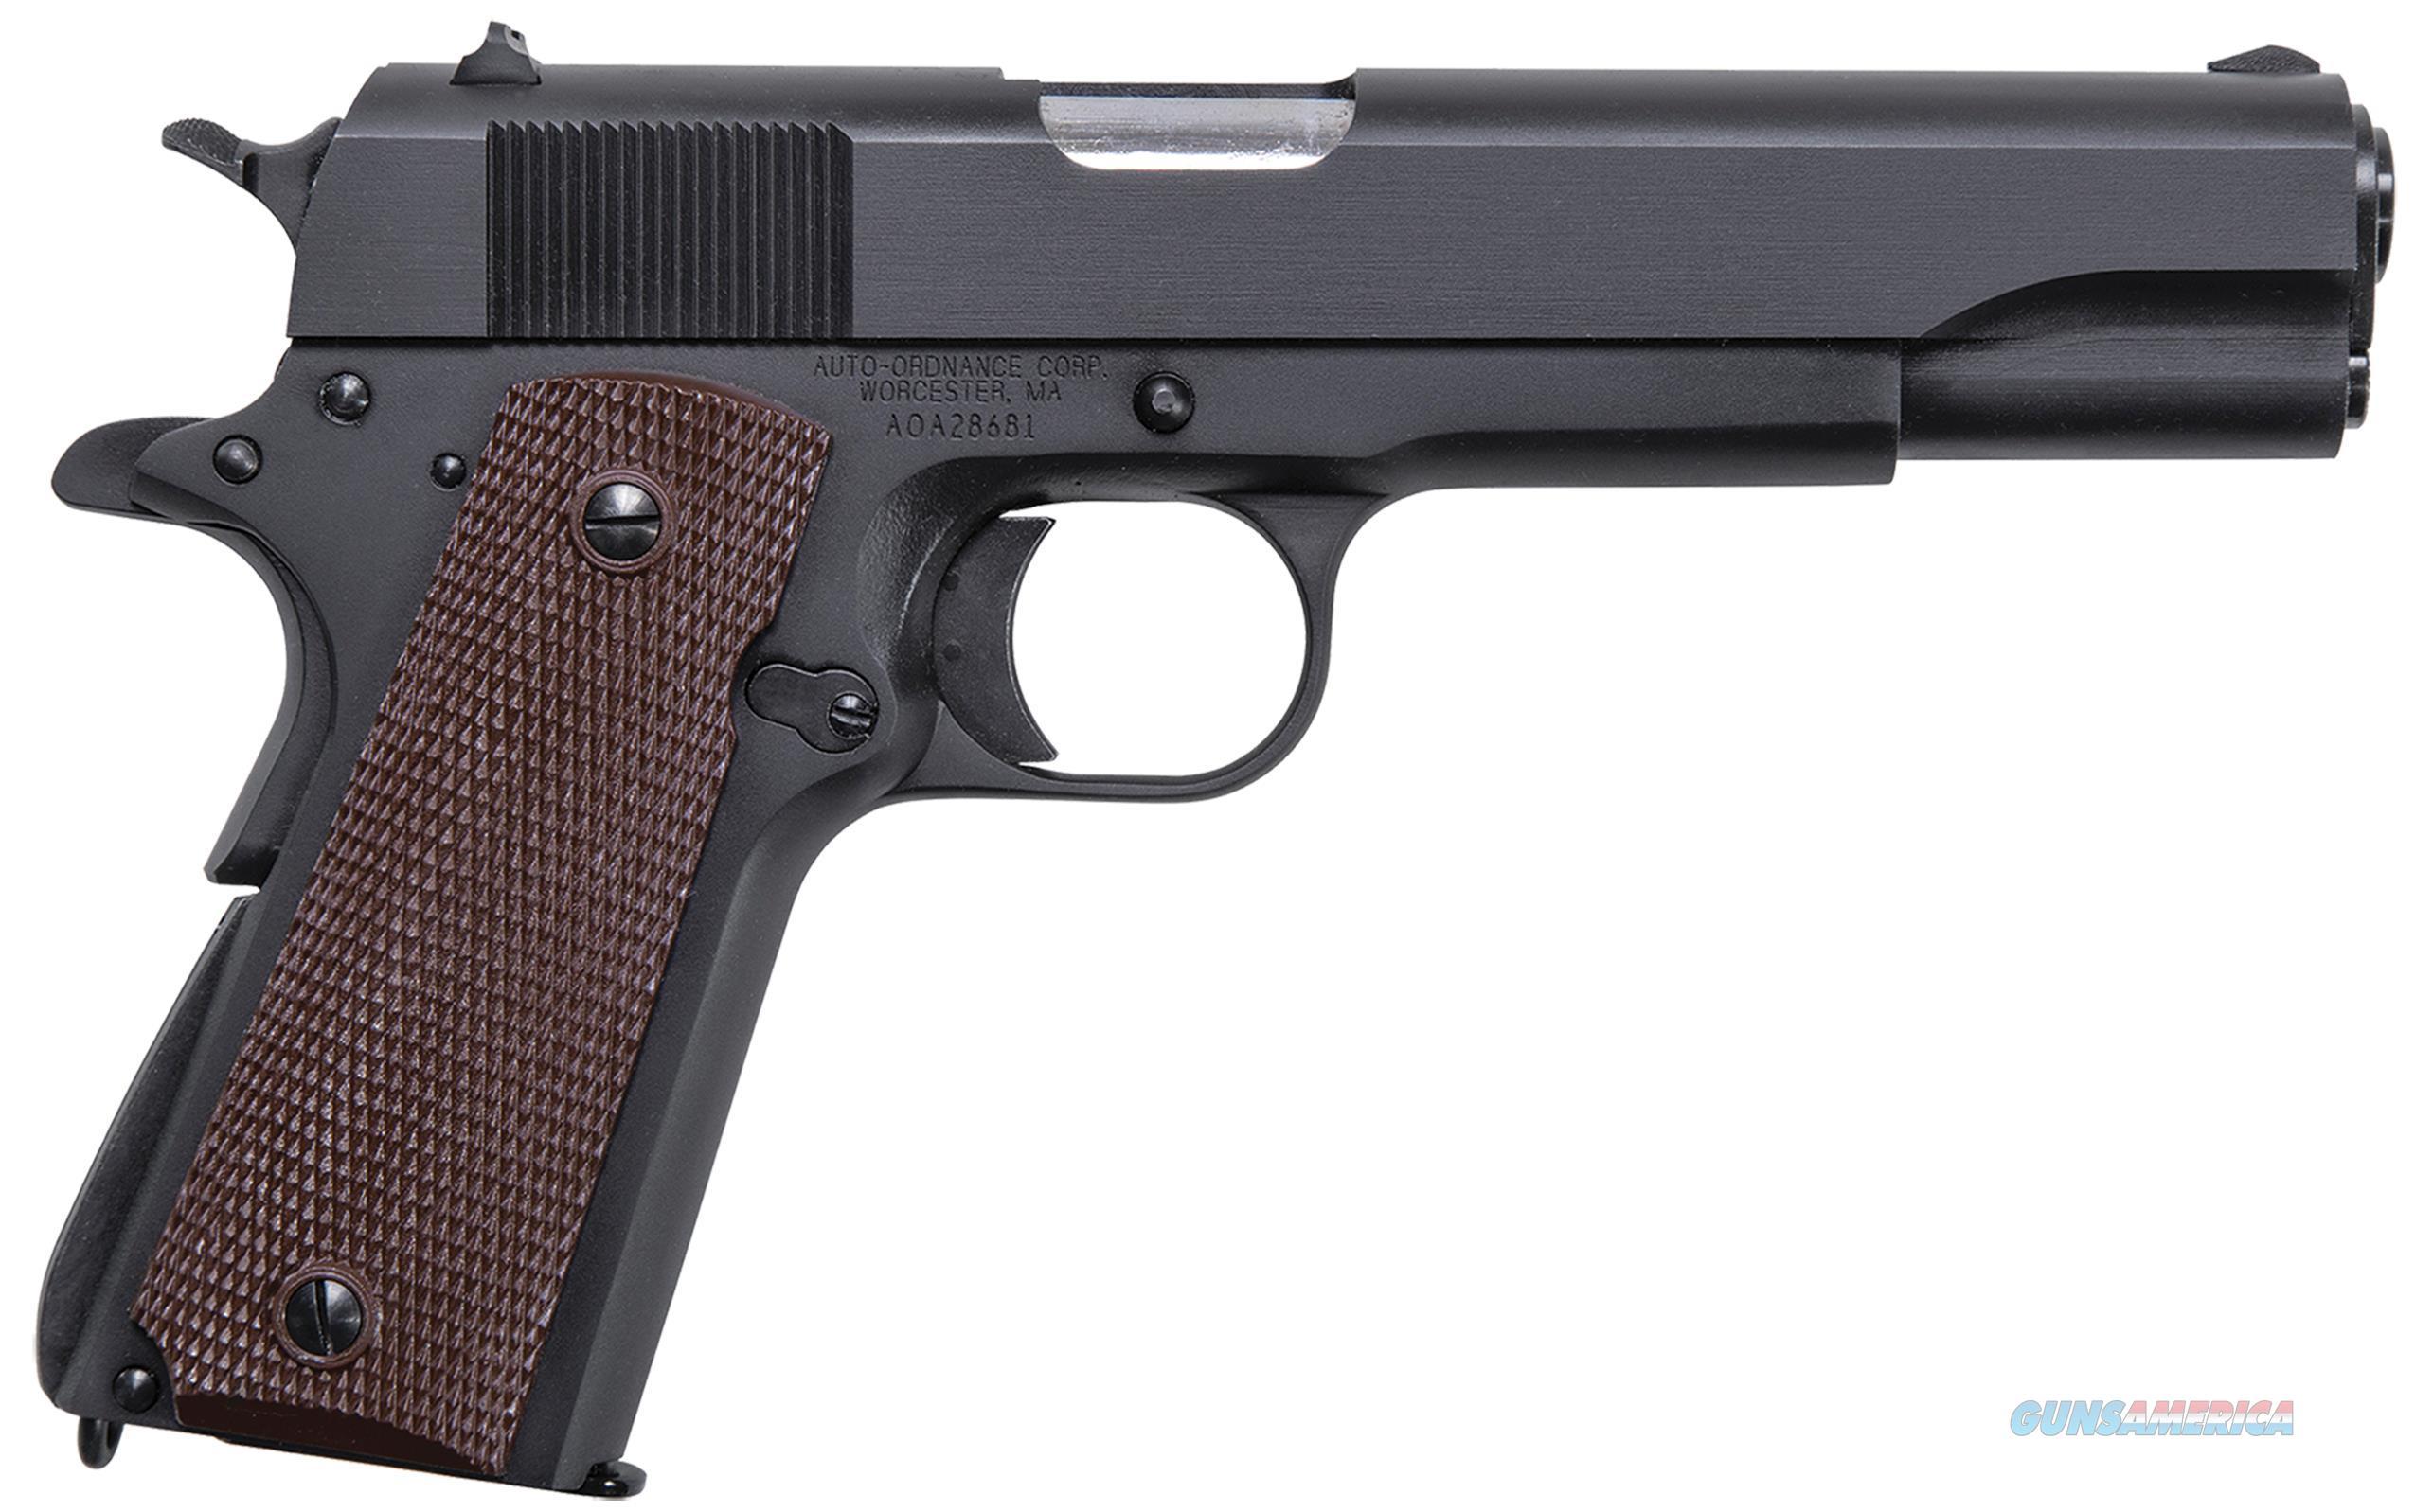 "Thompson 1911Bko 1911 Matte Black Single 45 Acp 5.0"" 7+1 Brown Checkered Grp Blk 1911BKO  Guns > Pistols > A Misc Pistols"